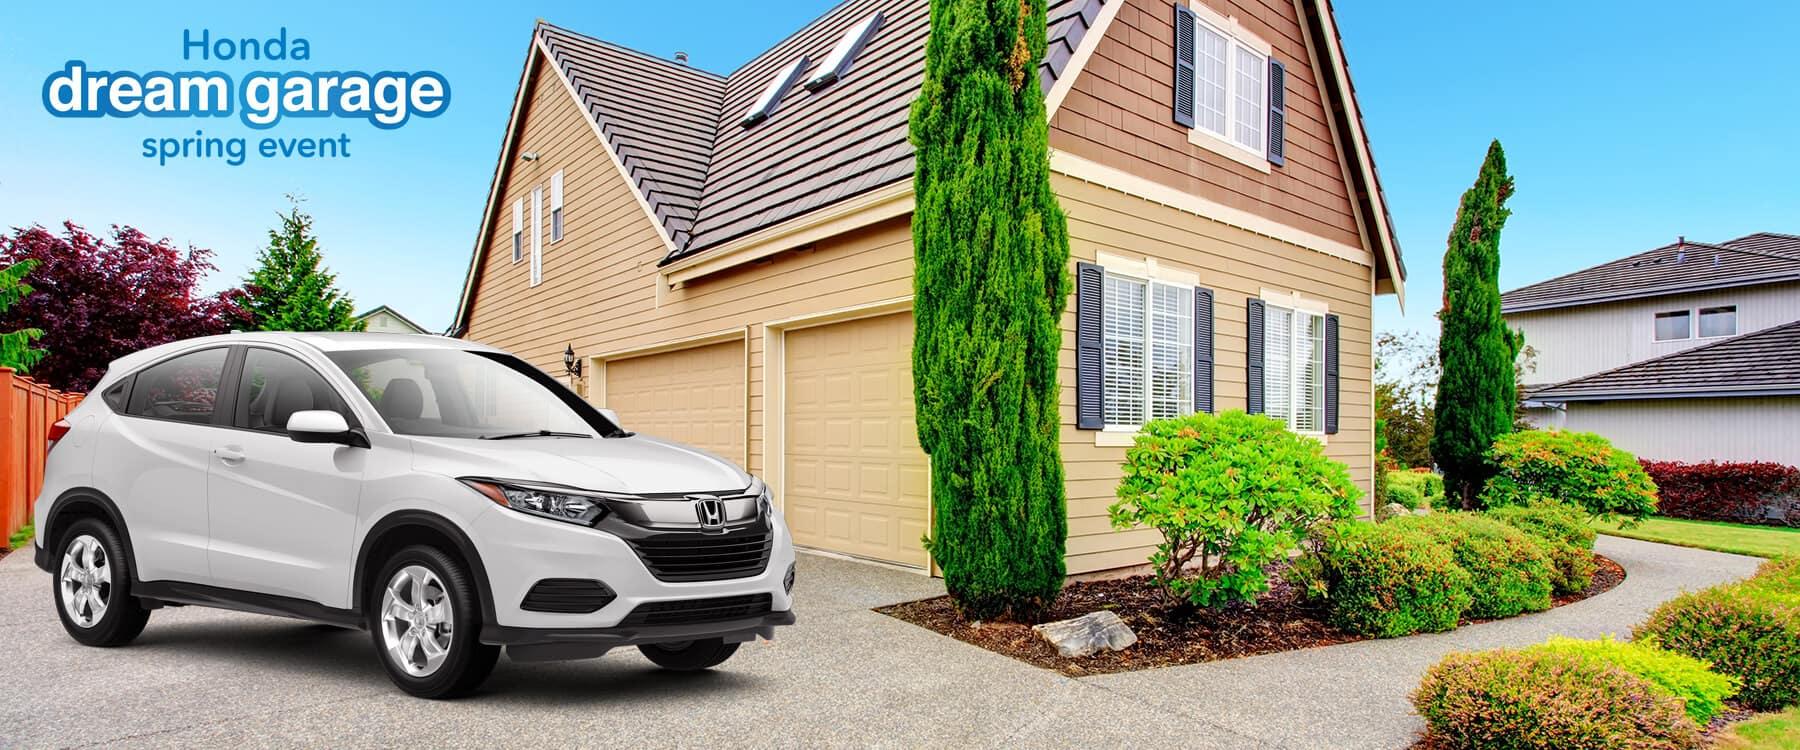 Honda Dream Garage Spring Event 2019 HR-V Slider